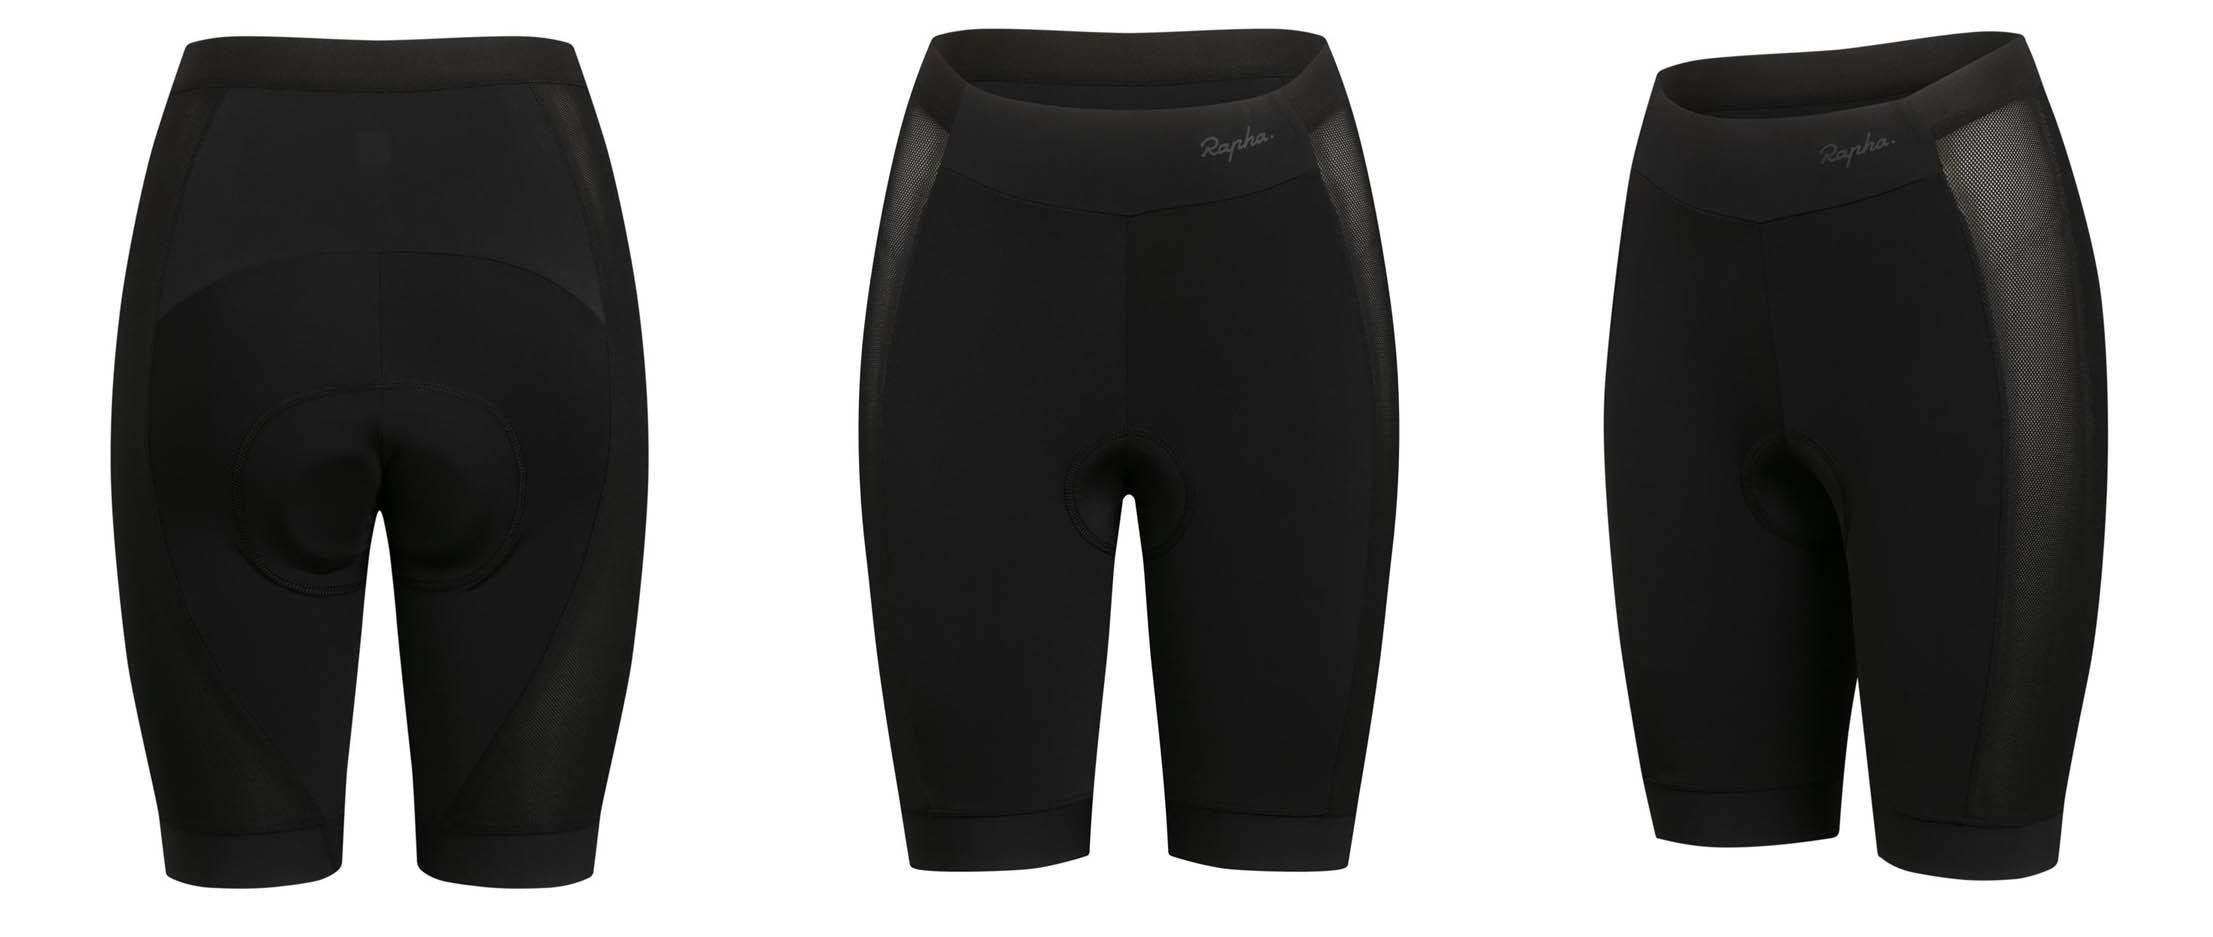 Rapha Performance Trailwear women's short liner